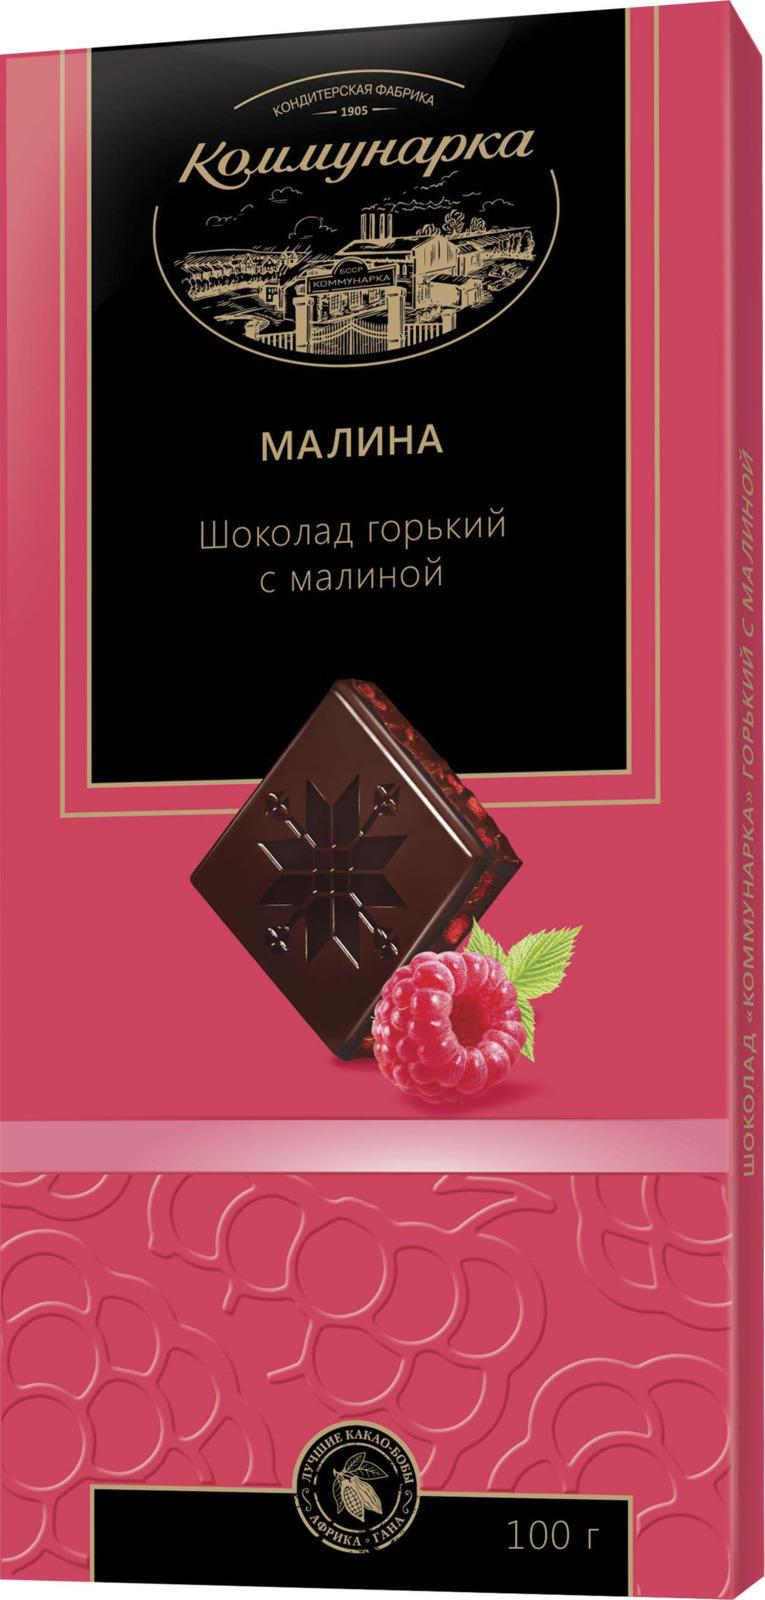 Шоколад Коммунарка, горький, с малиной, 100 г цена 2017